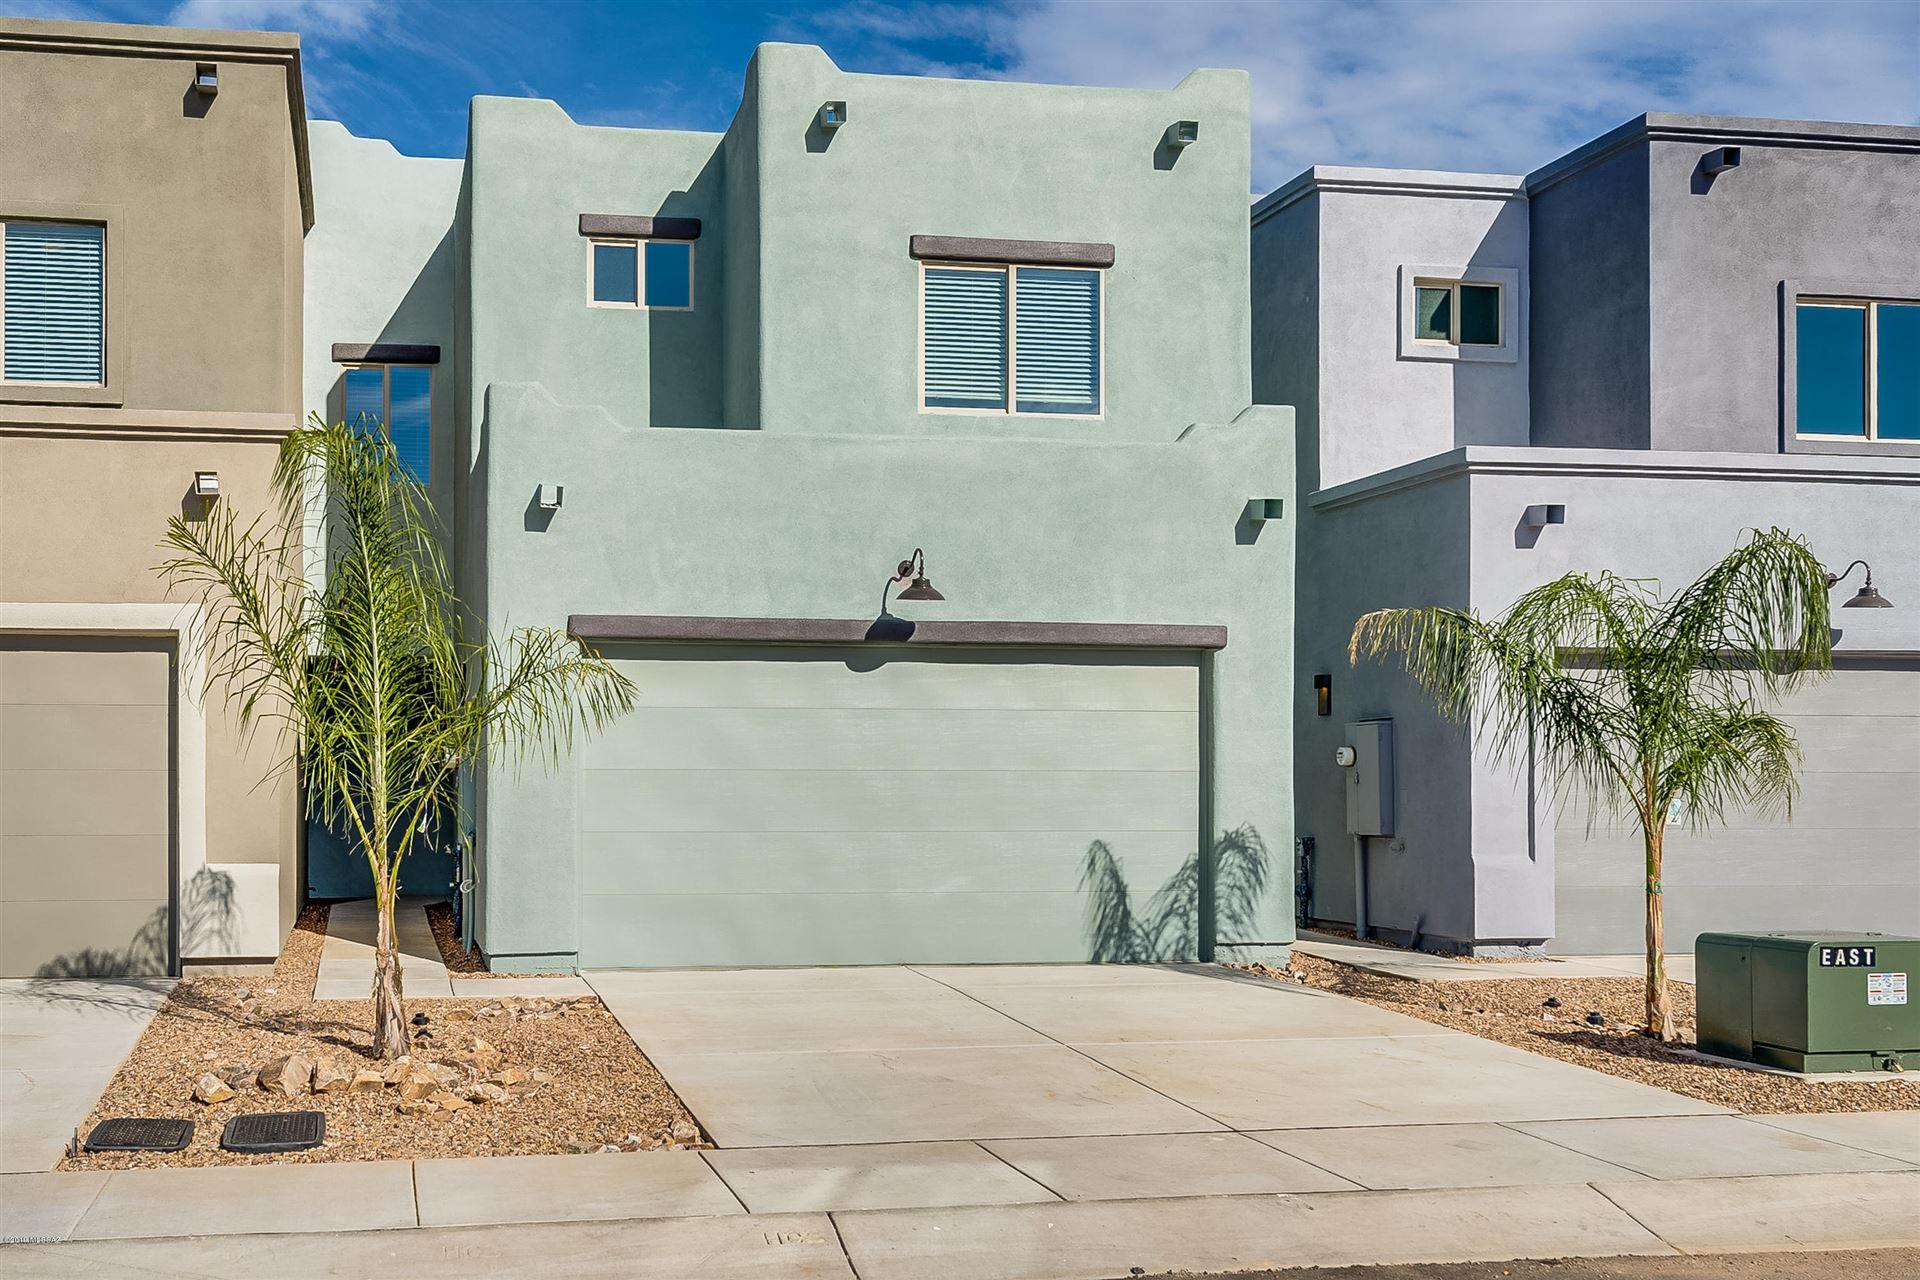 8155 E Cricket Song Trail, Tucson, AZ 85730 - #: 21931701